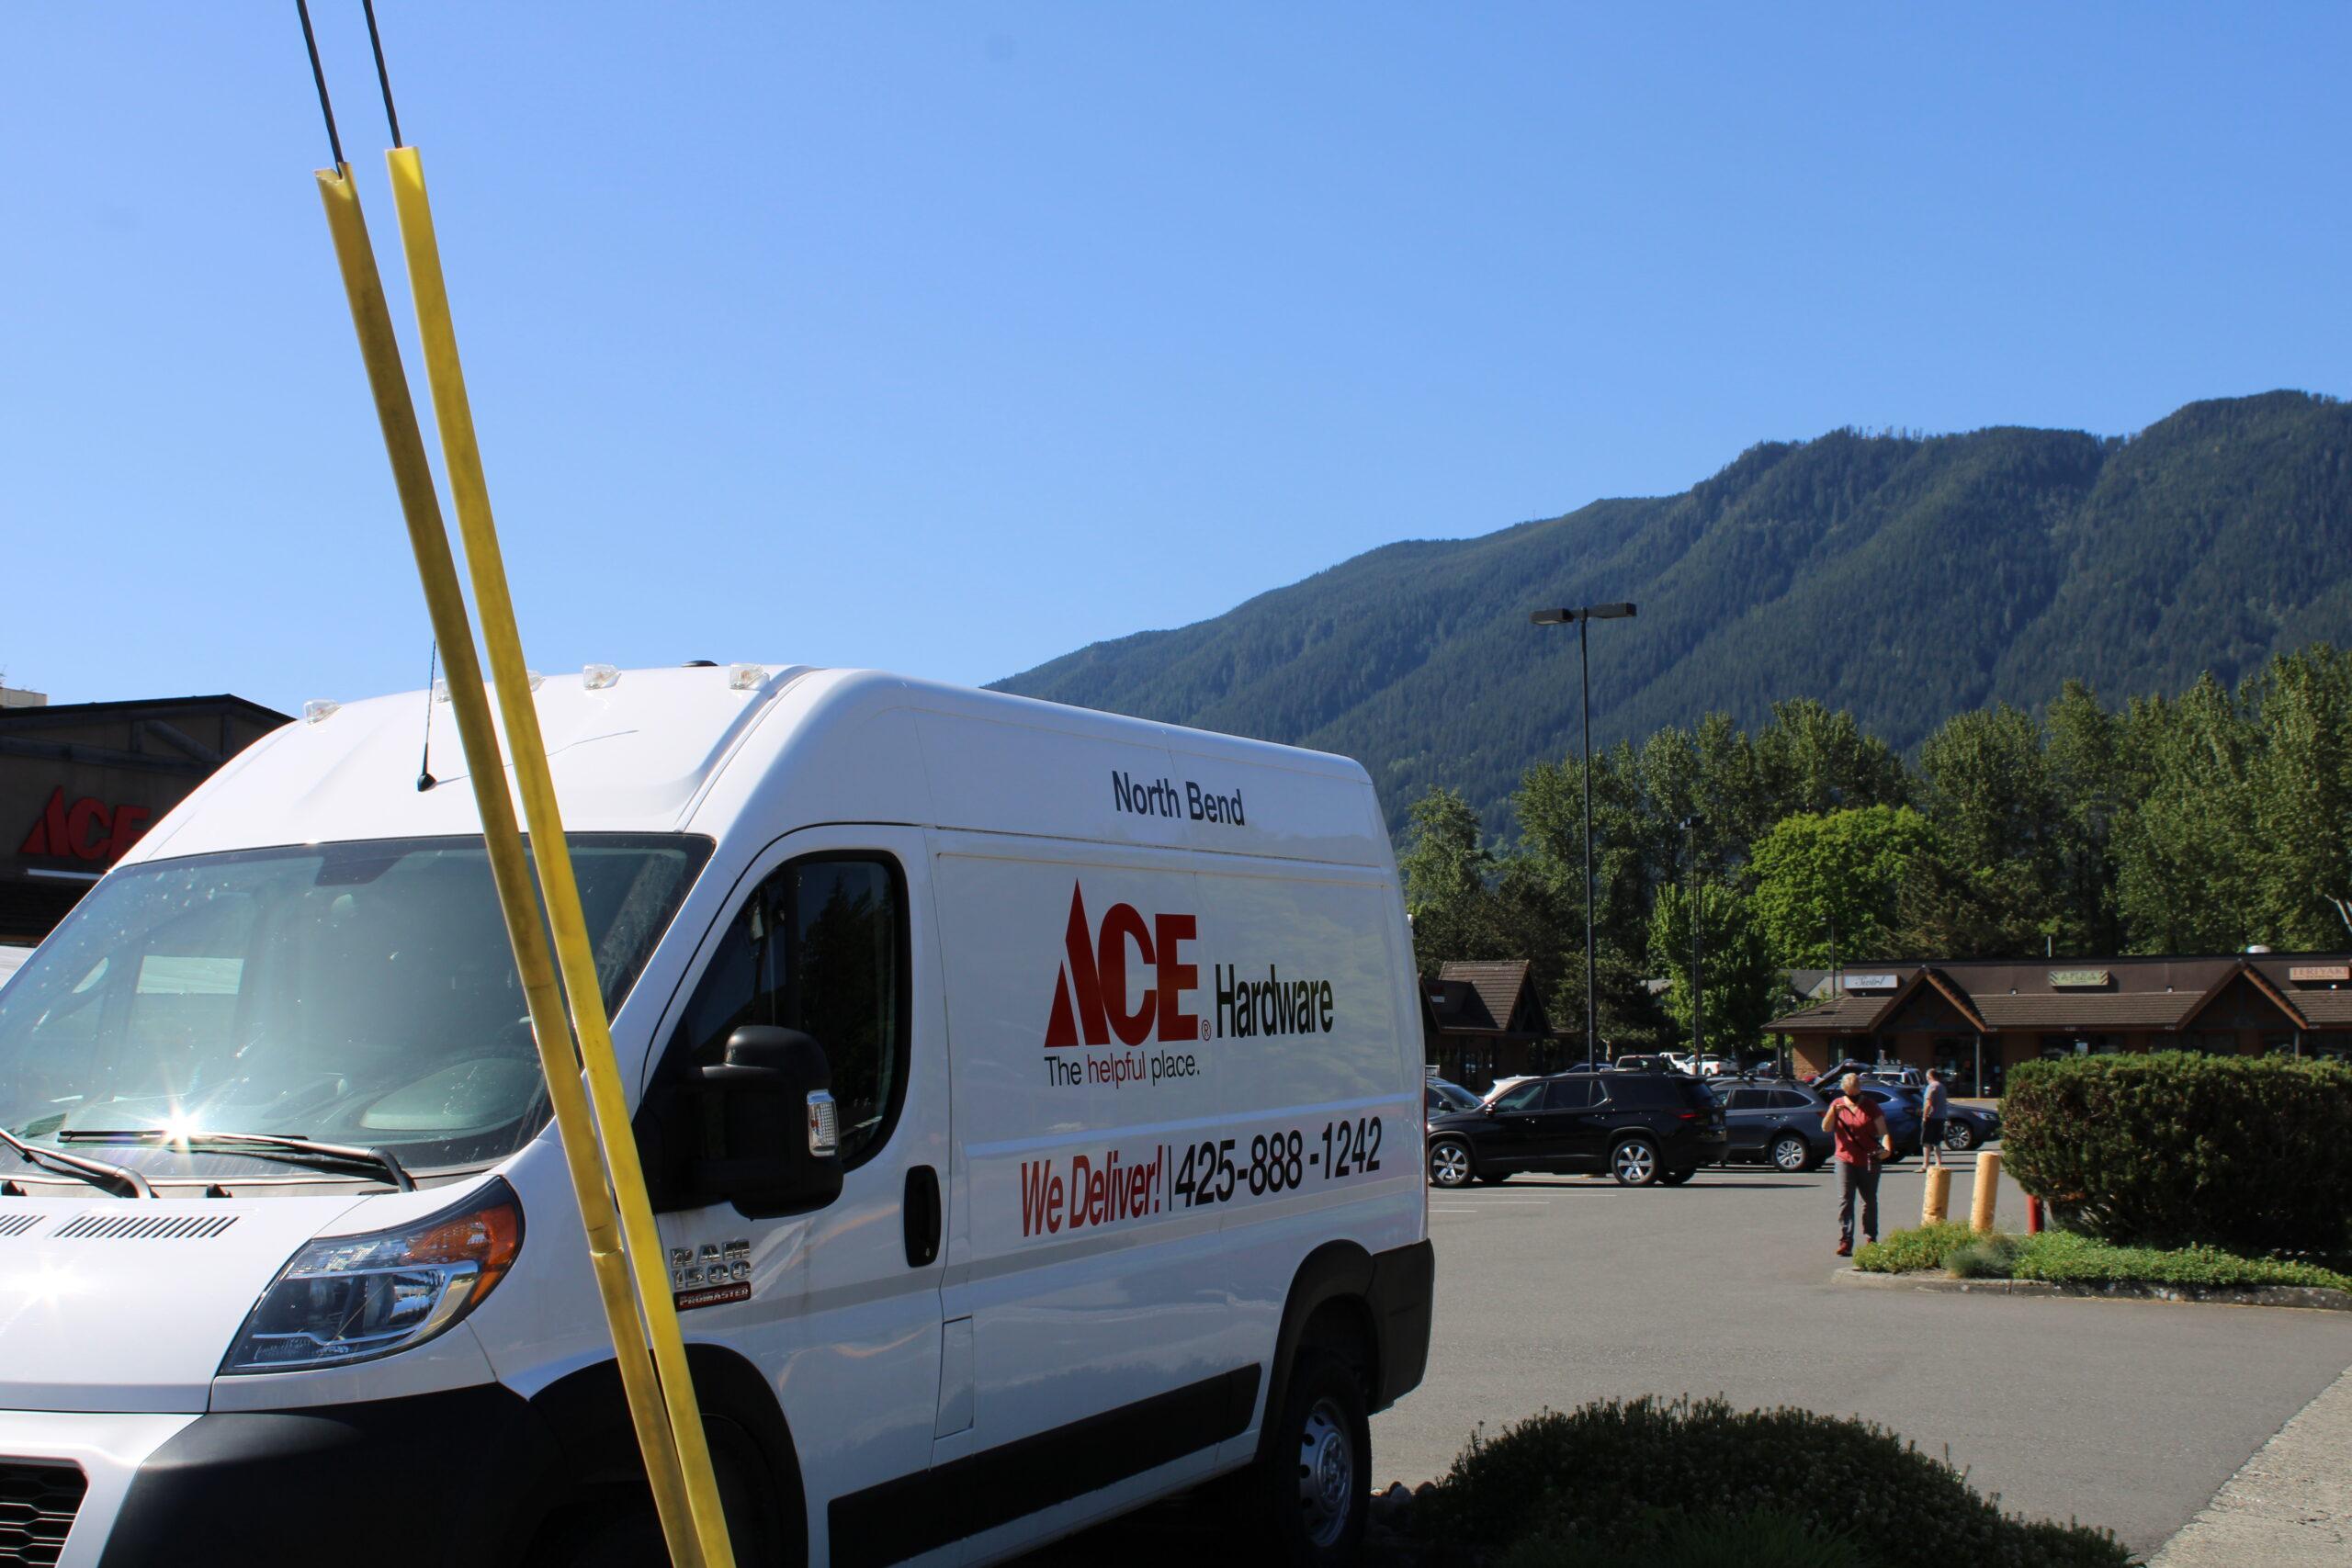 Ace Hardware Truck